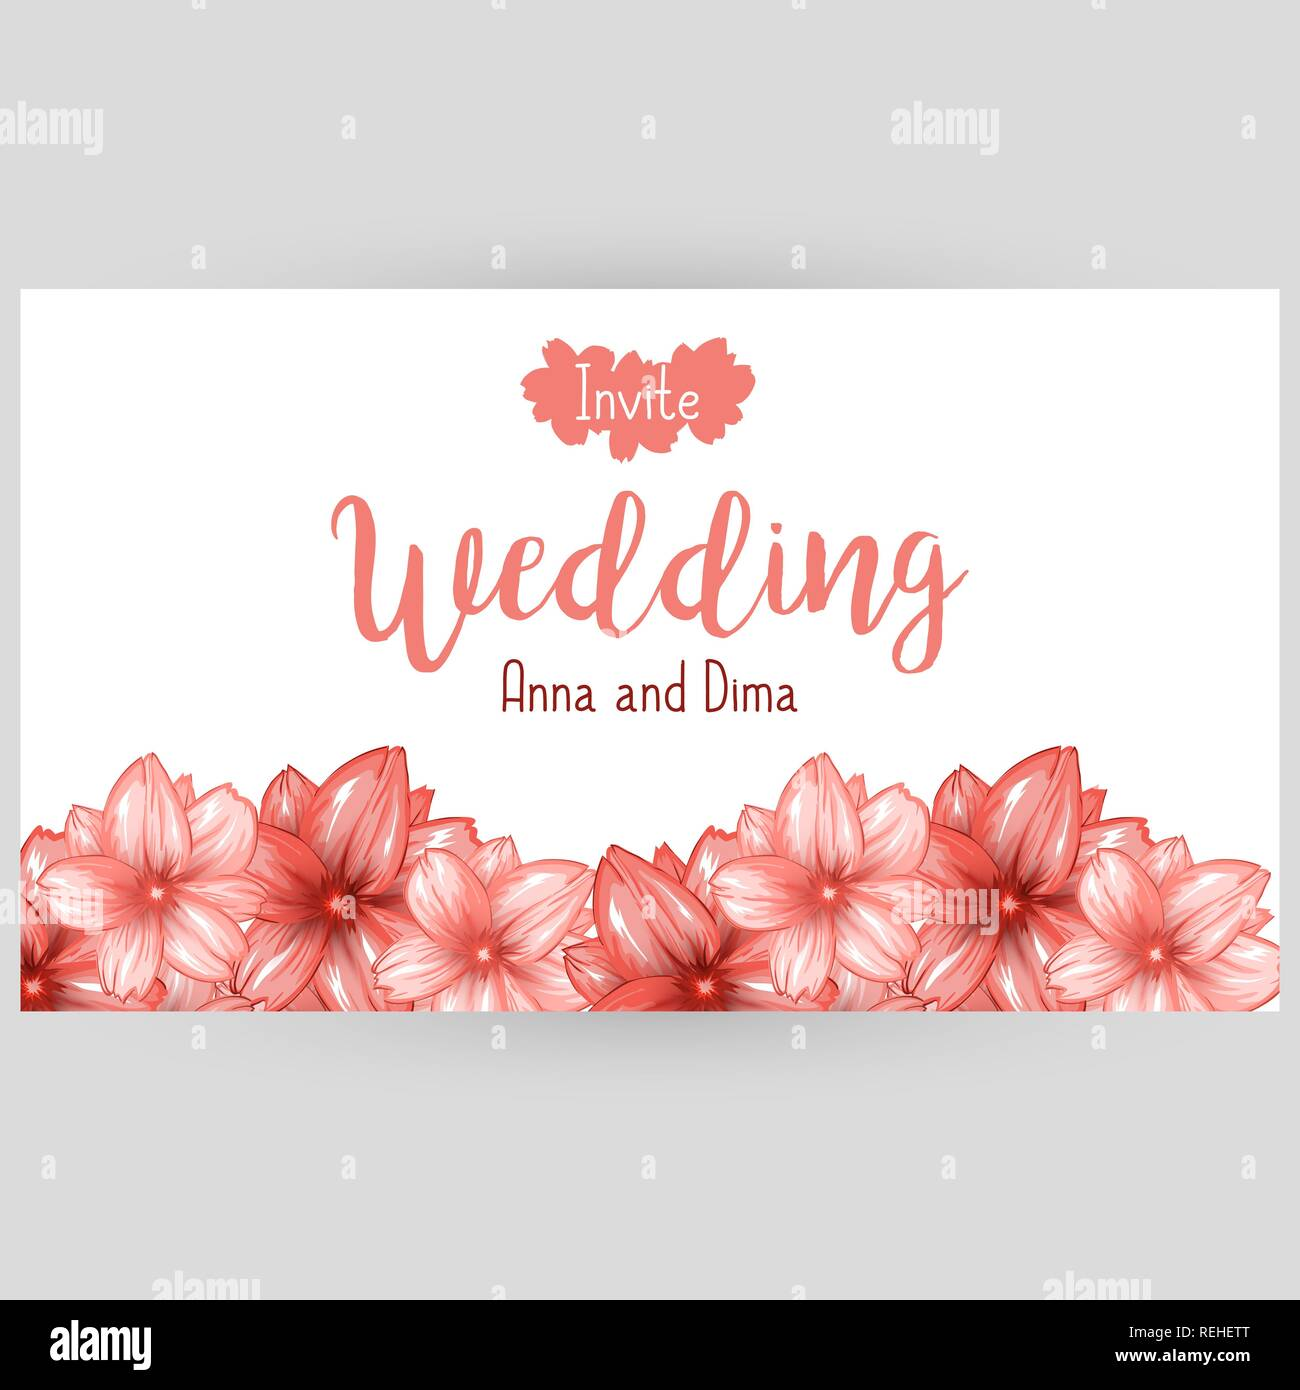 Wedding horizontal banner or website header design with pink japanese cherry blossom. Vector illustration - Stock Image